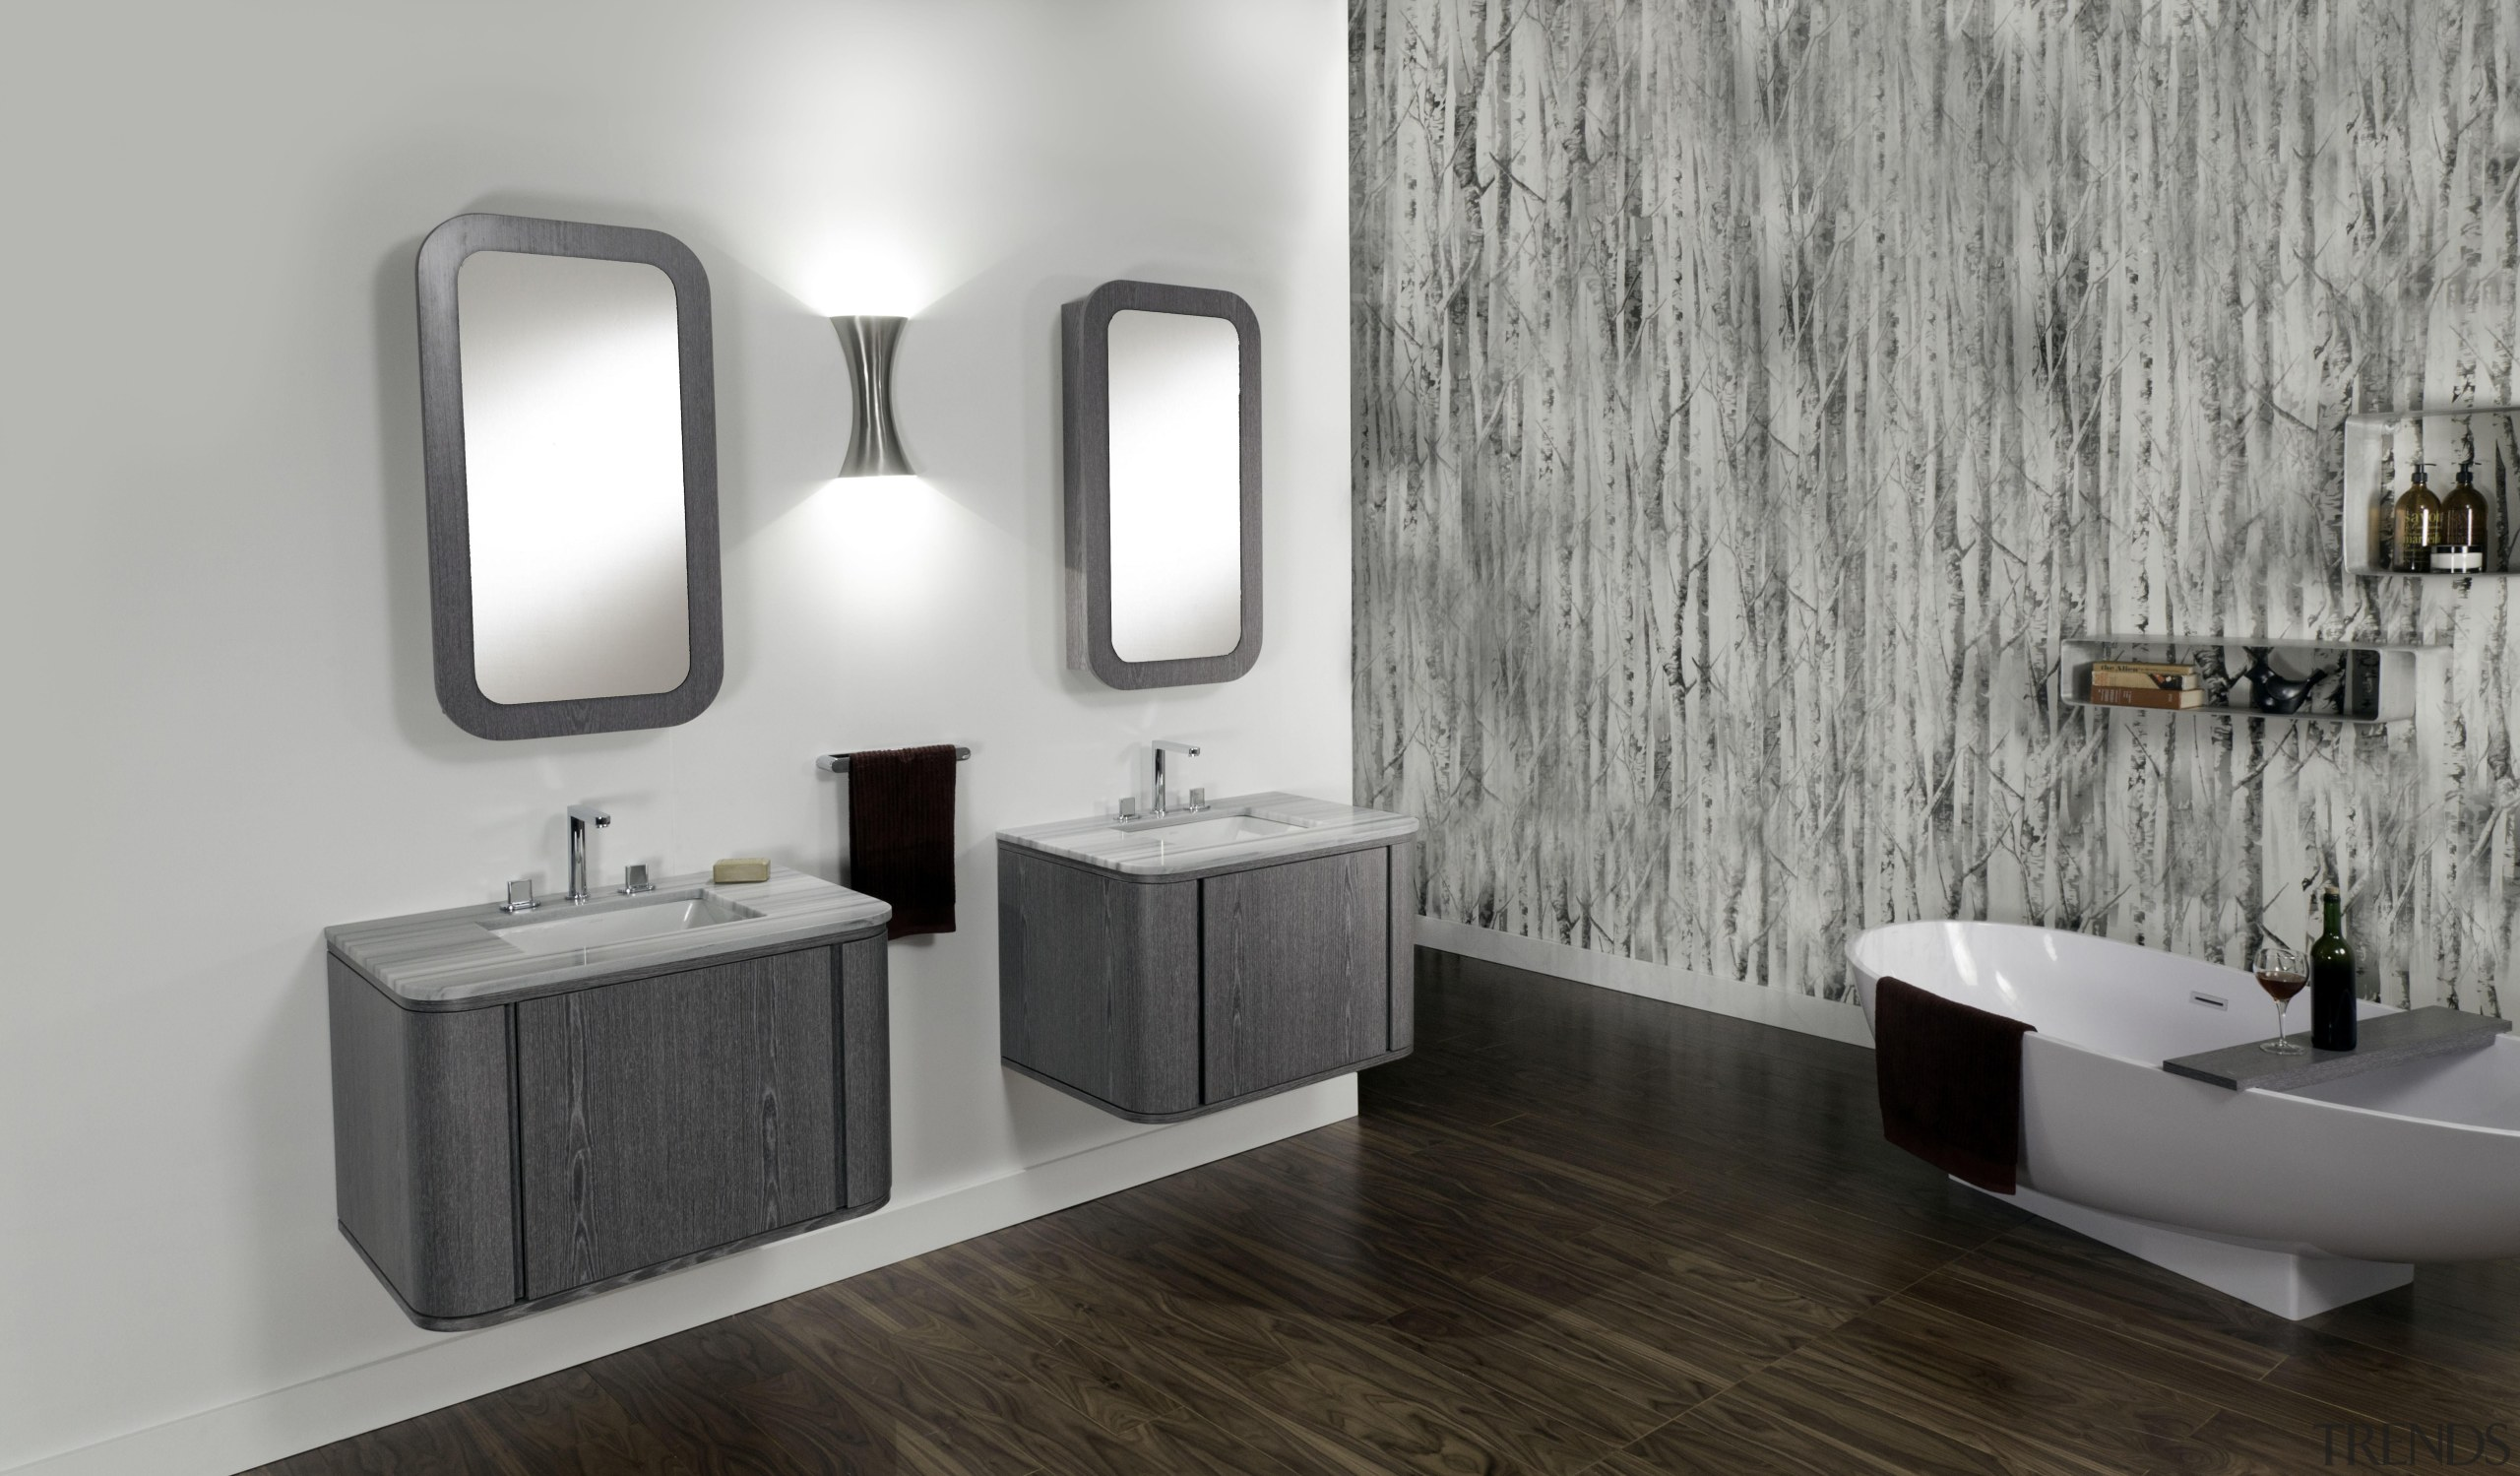 Free-standing under-counter vanity for one lavatory, with one bathroom, bathroom accessory, bathroom cabinet, floor, interior design, plumbing fixture, product design, room, sink, tap, gray